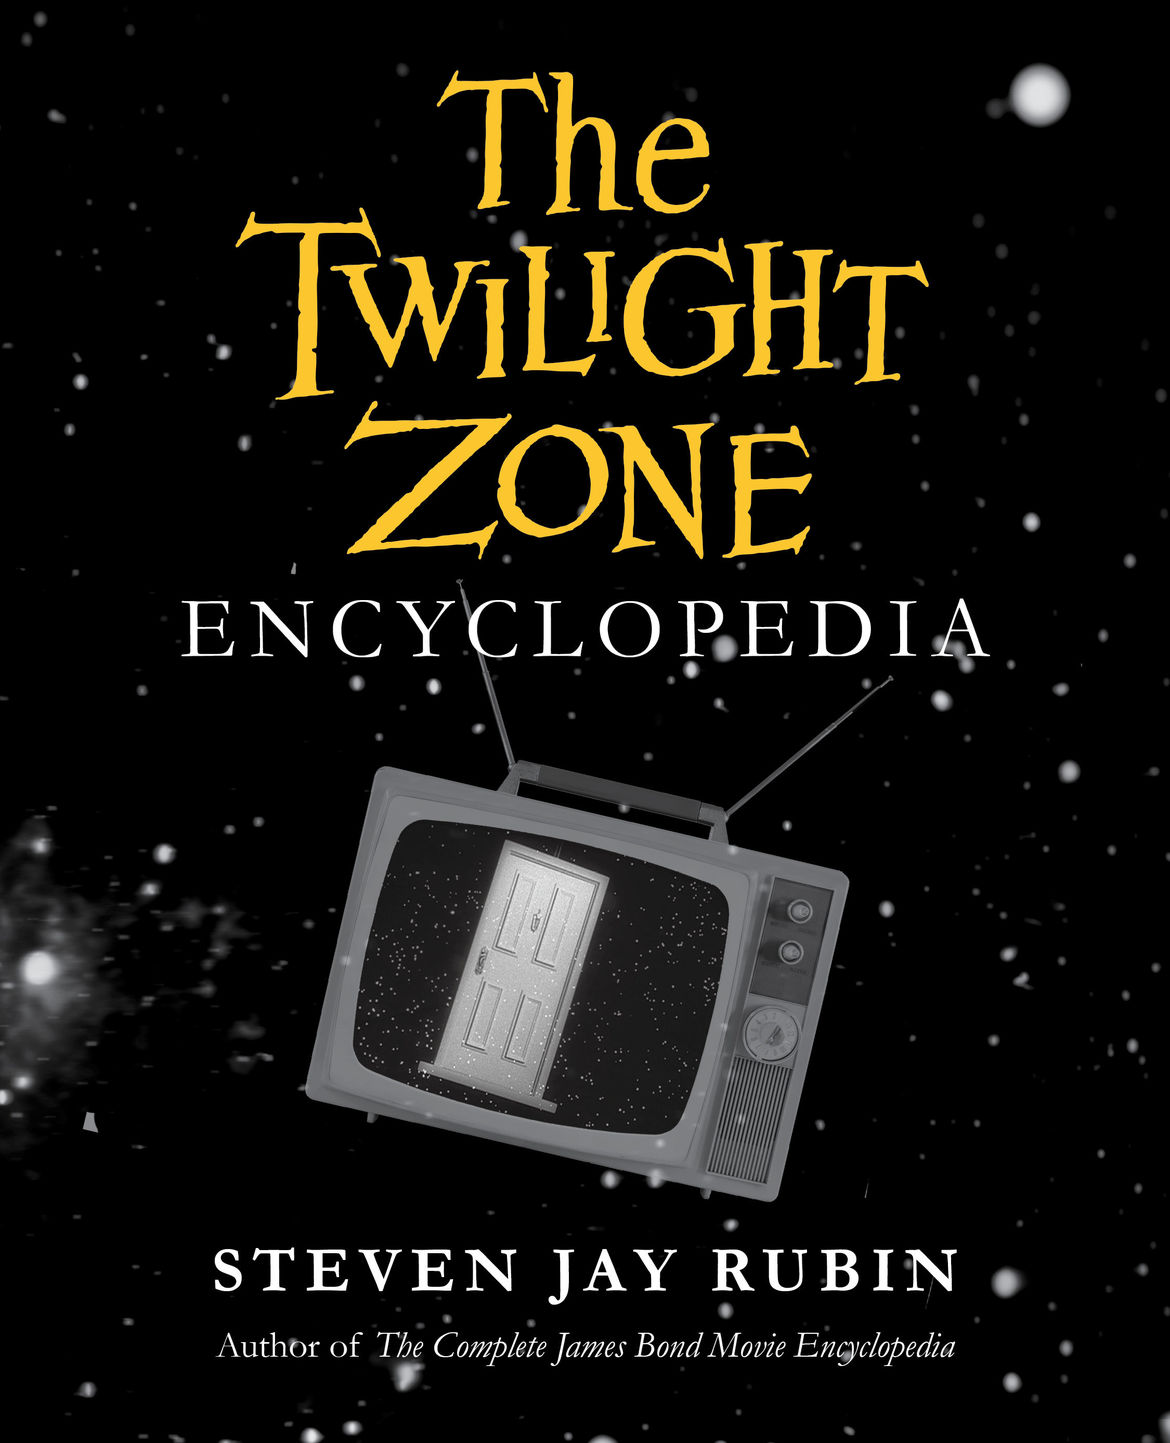 Twilight Zone Encyclopedia, The